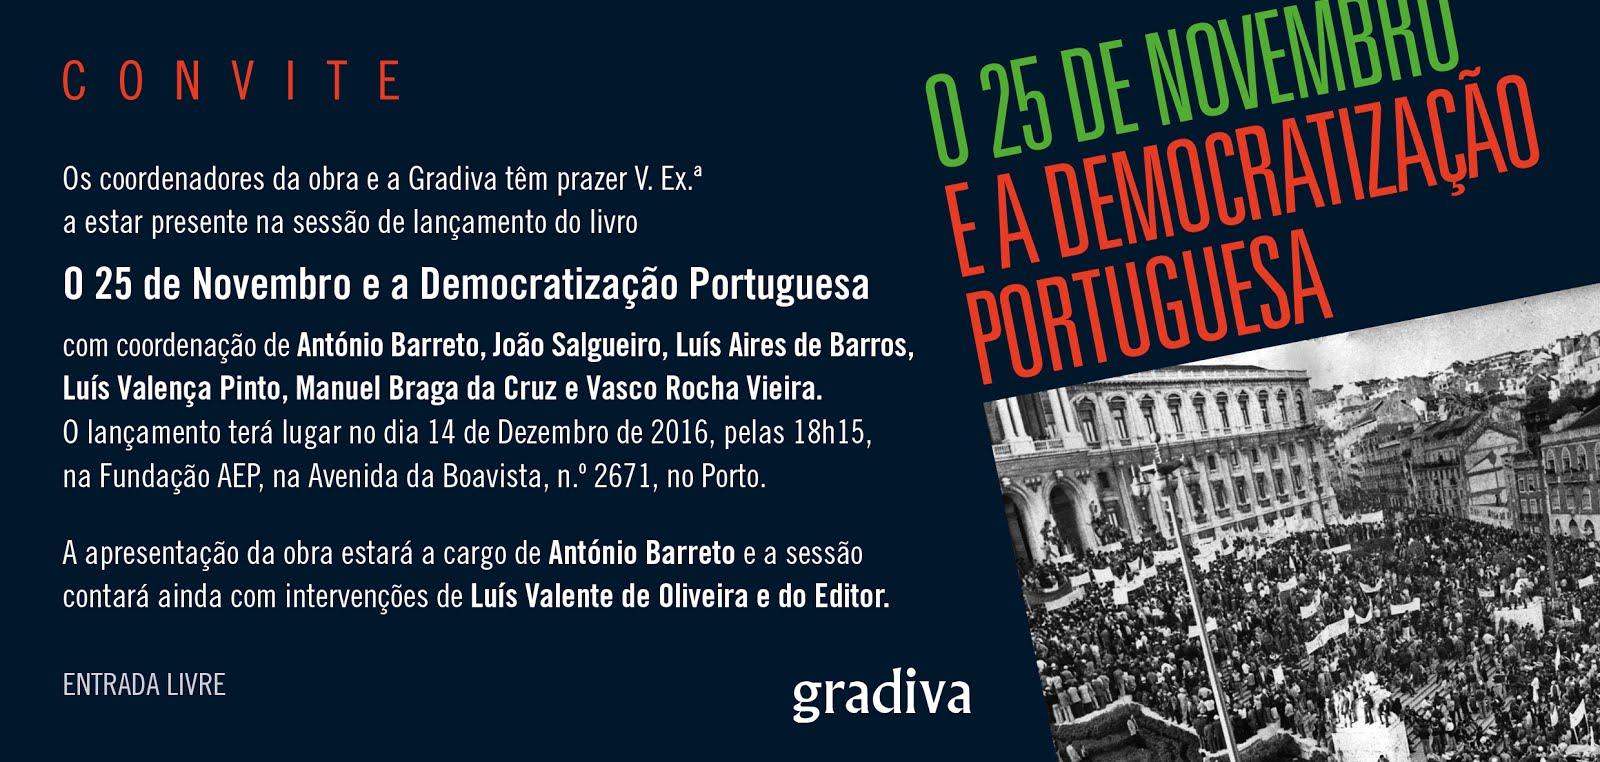 14 de dezembro, 18h15: Porto